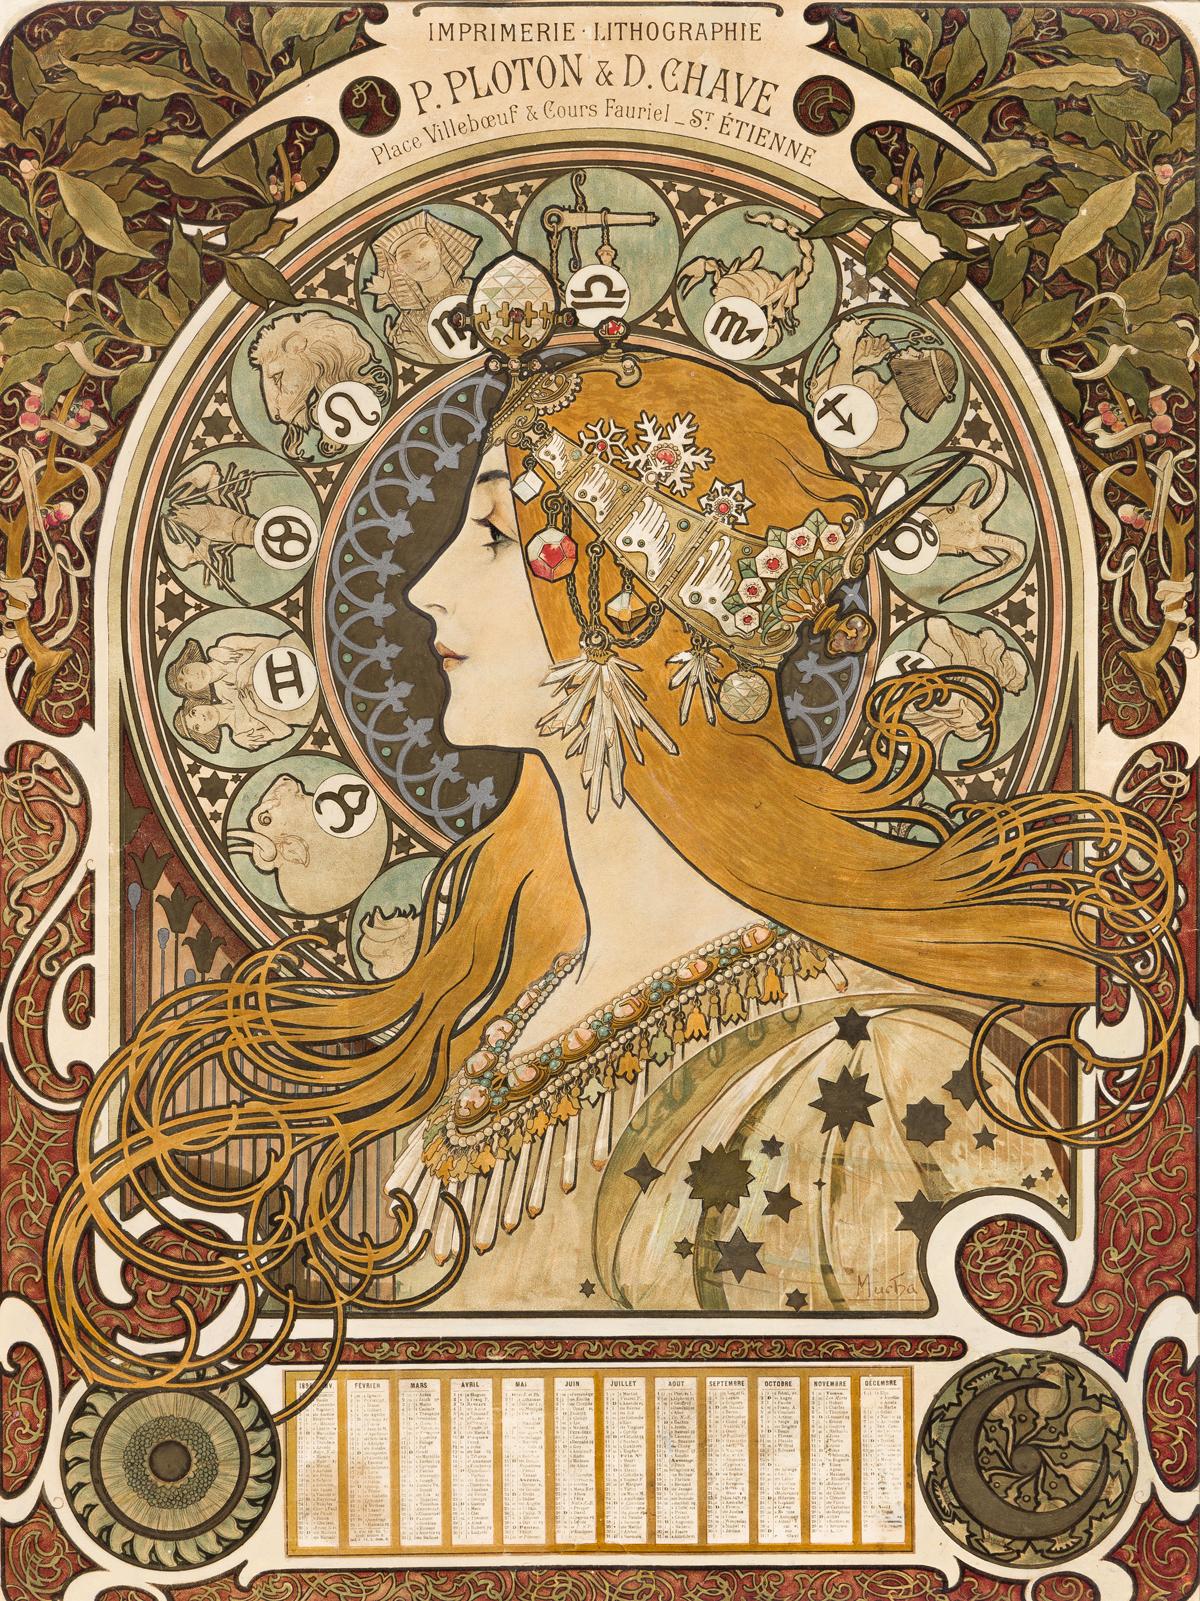 ALPHONSE MUCHA (1860-1939).  [ZODIAC / P. PLOTON & D. CHAVE.] 1898. 24x18 inches, 61x45 cm. [F. Champenois, Paris.]